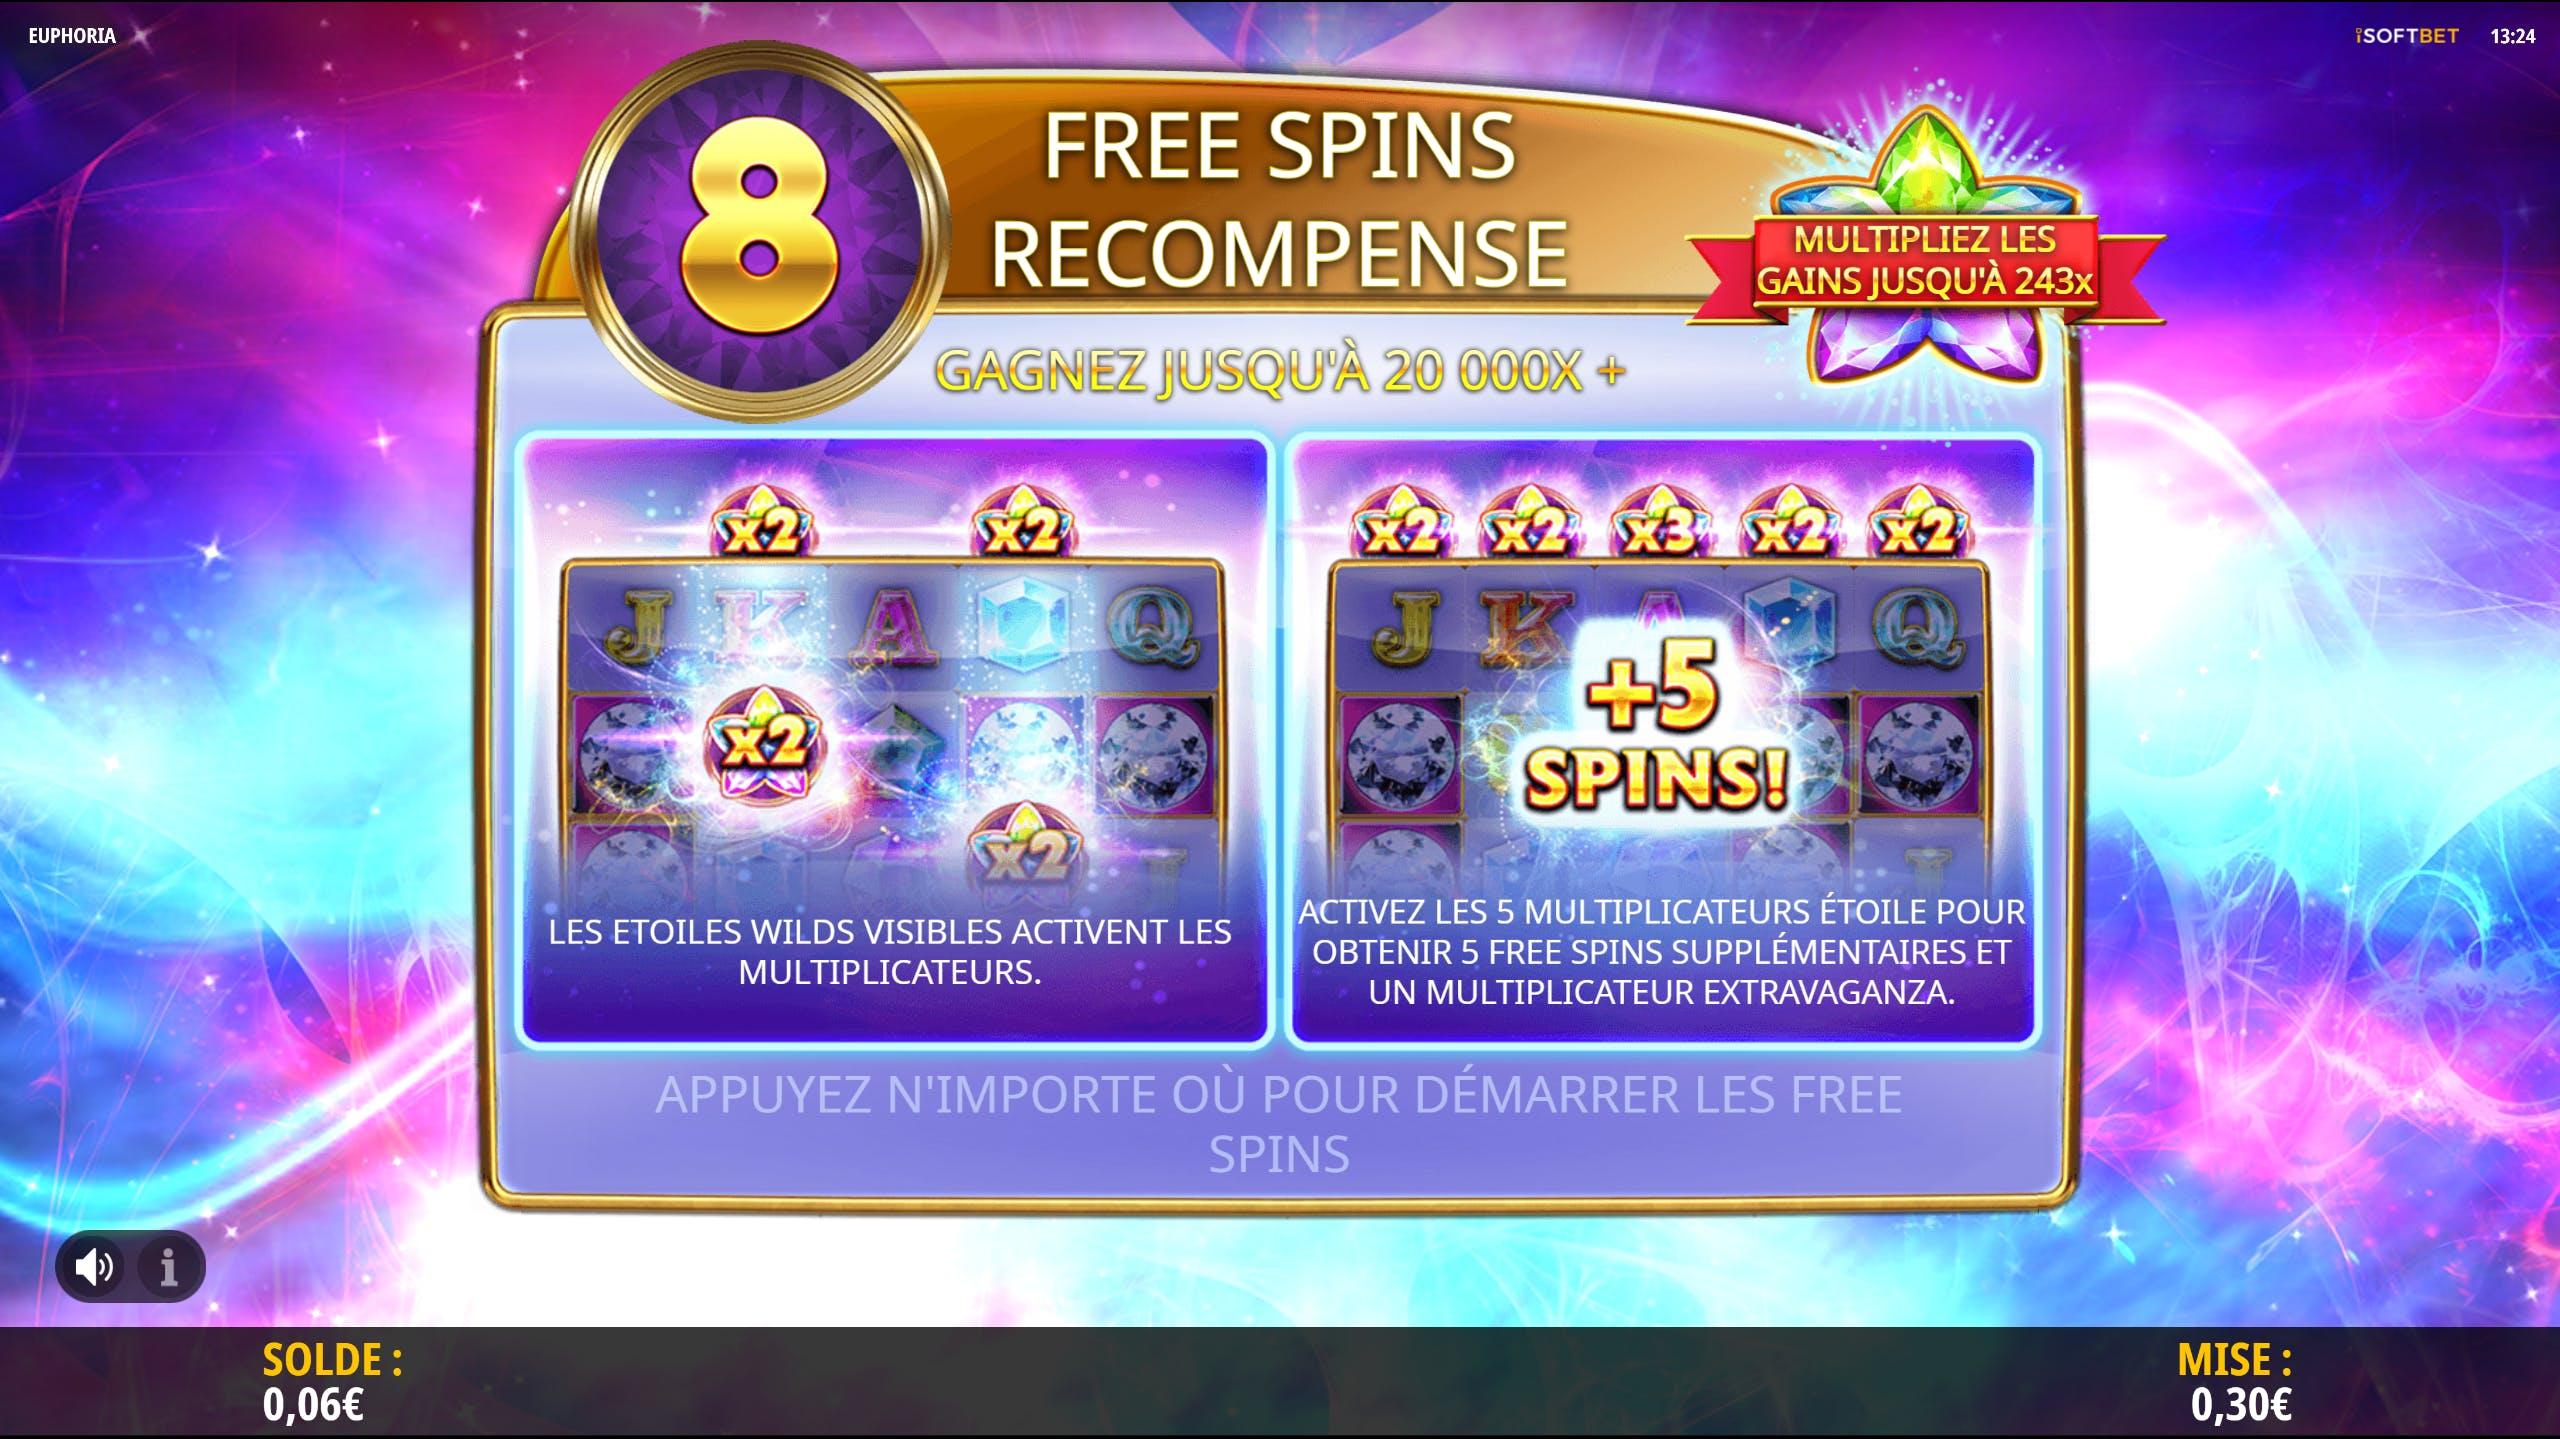 Euphoria Free Spins reward from ISoftBet provider